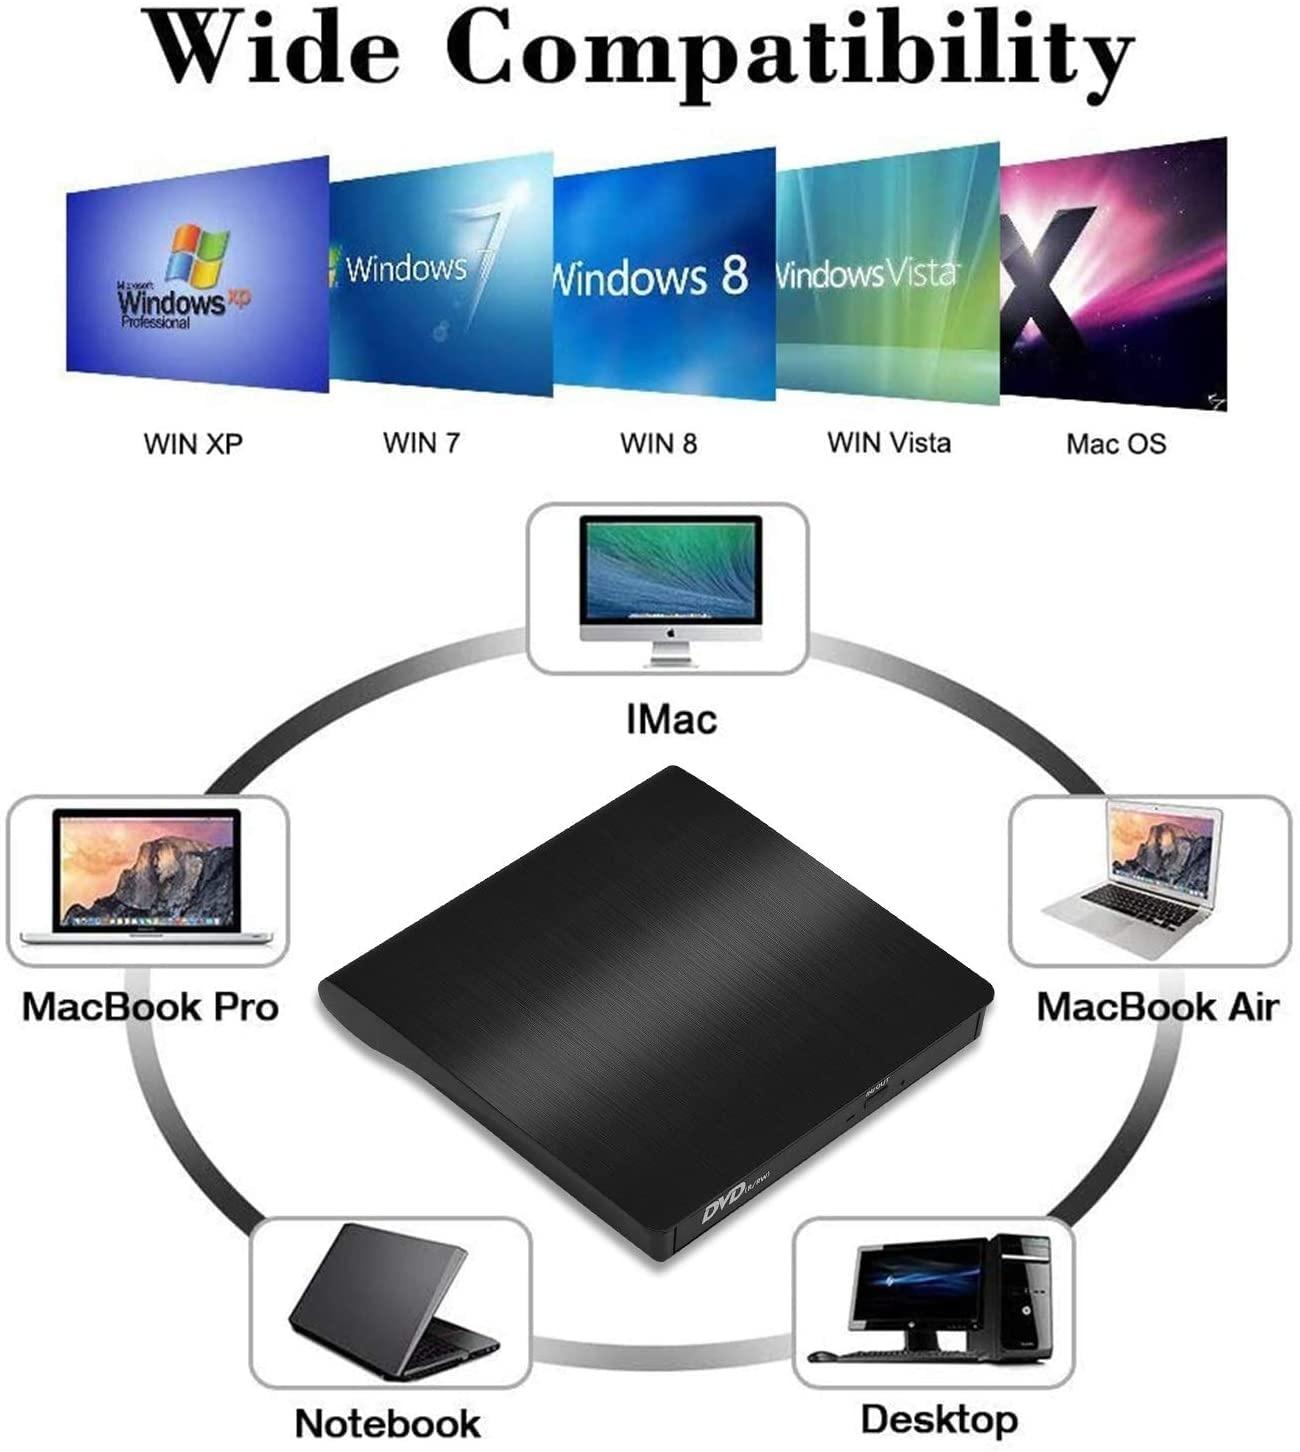 External USB 3.0 CD Player DVD Drive ROM Optical Reader Writer Burner for Windows 10/8/7, Linux,MacBook Pro Surface Pro Black - 5